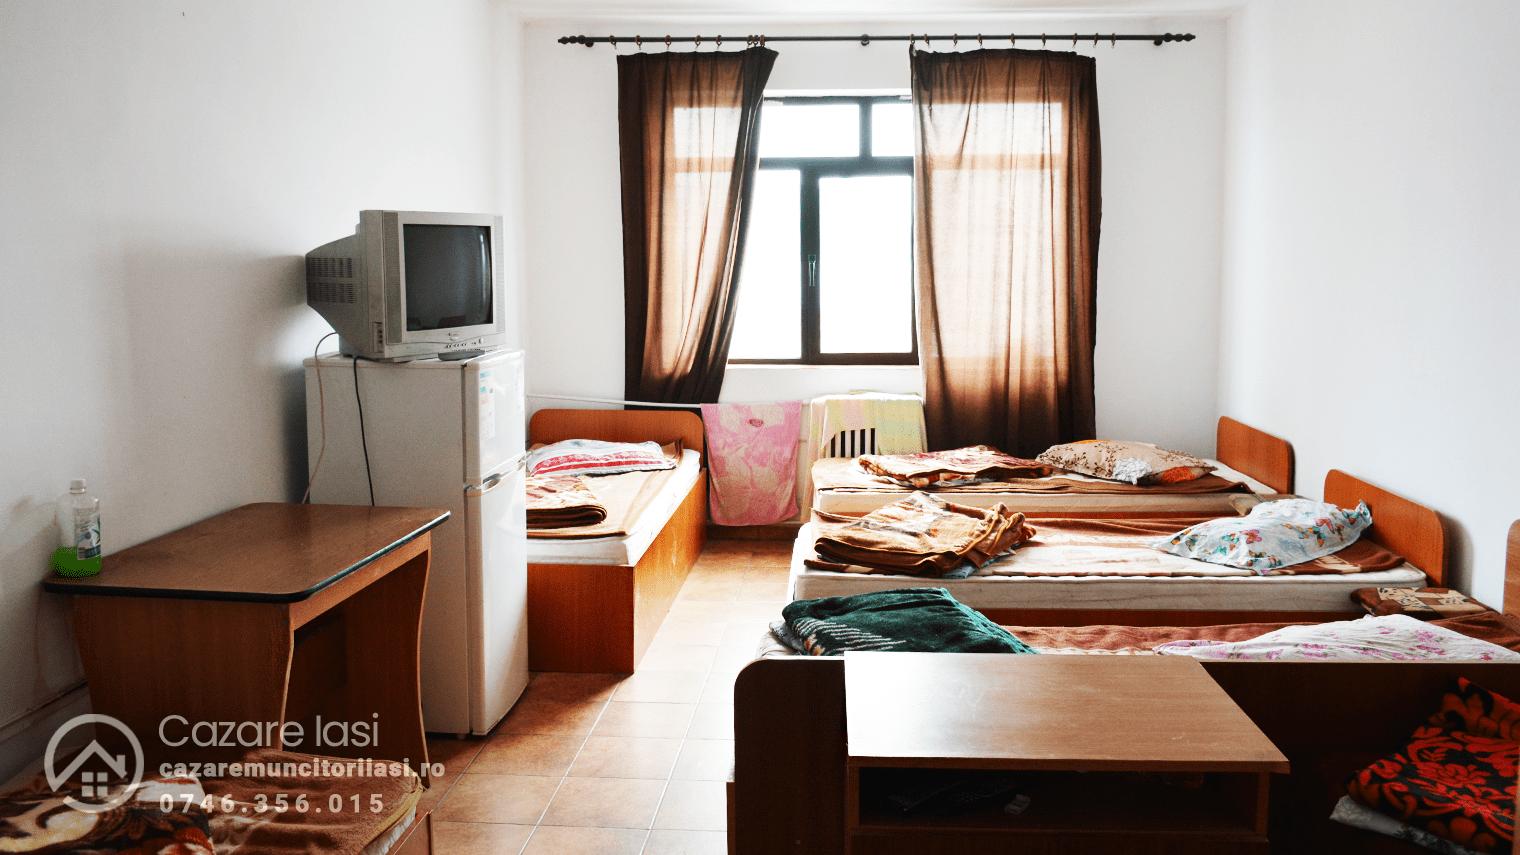 Hostel Iasi camere 4x